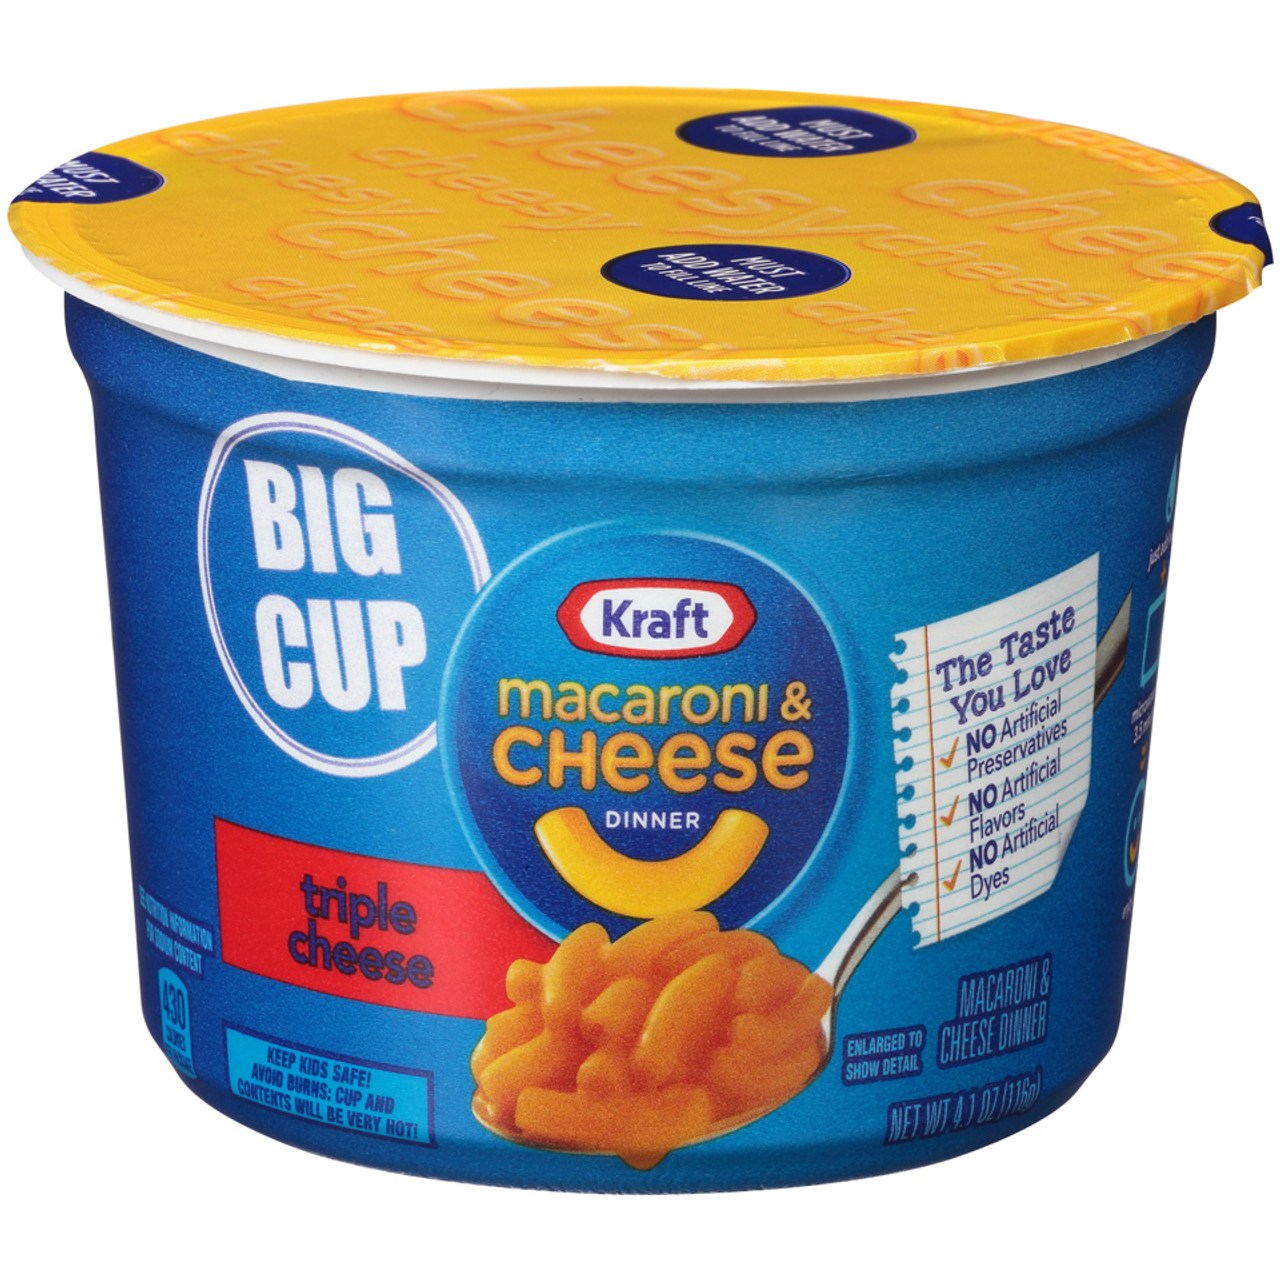 kraft macaroni and cheese triple cheese 4 1 oz big microwavable bowl 1 count